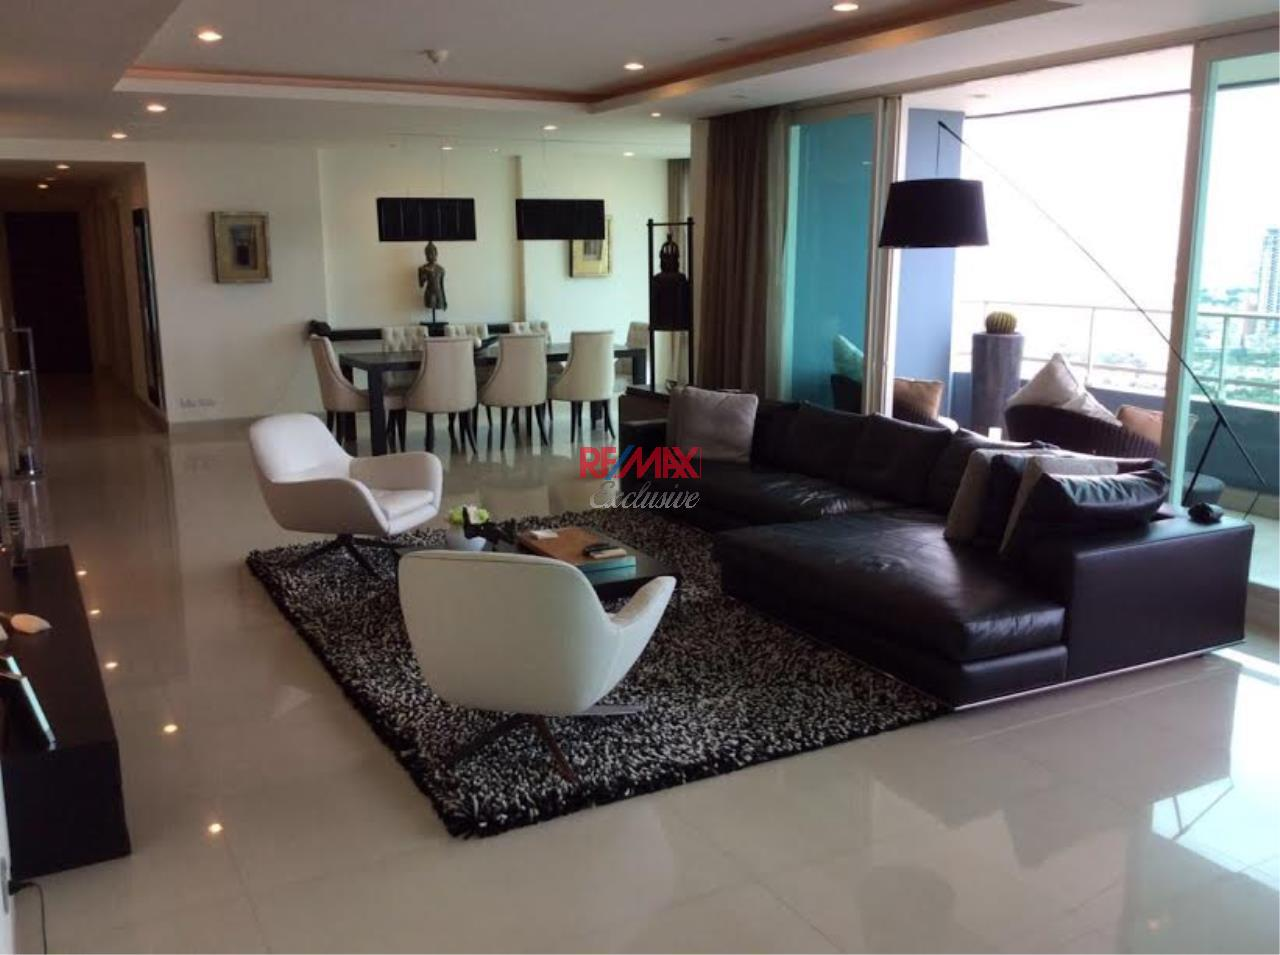 RE/MAX Exclusive Agency's Watermark Chaophraya Condominium, 4 bedrooms, 4 bathrooms, For Sale 47,500,000 THB 2